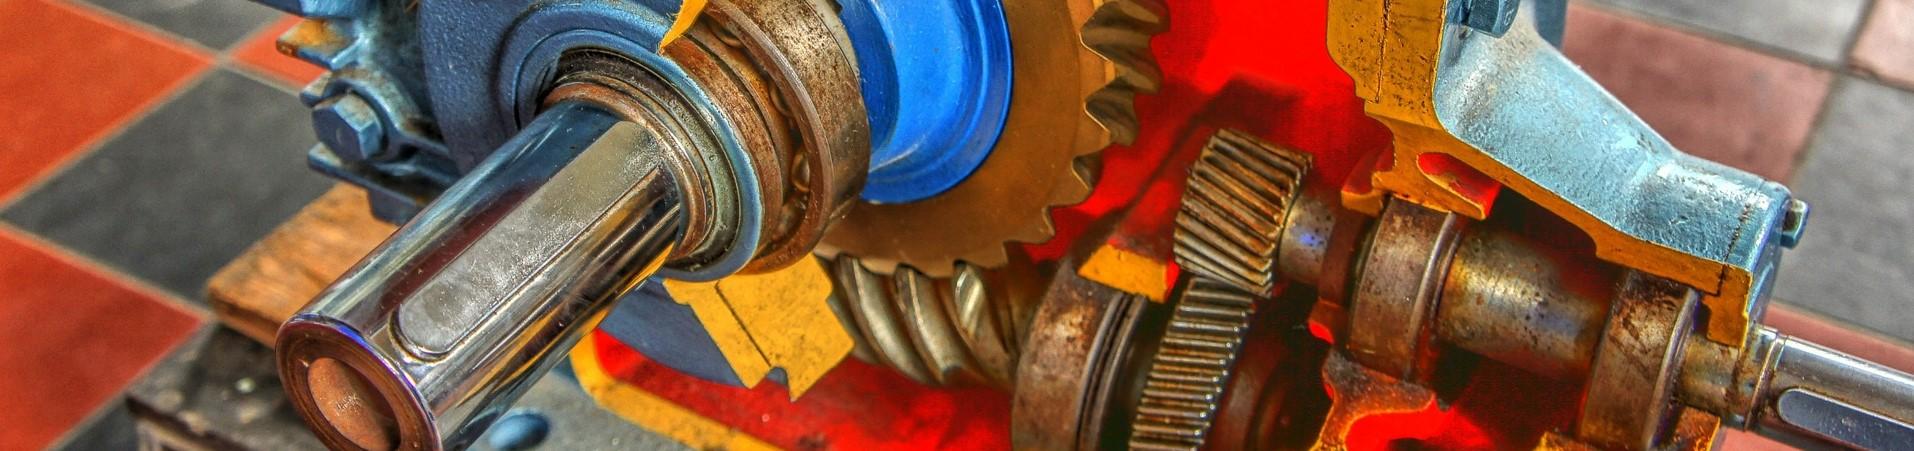 ANSYS Mechanical